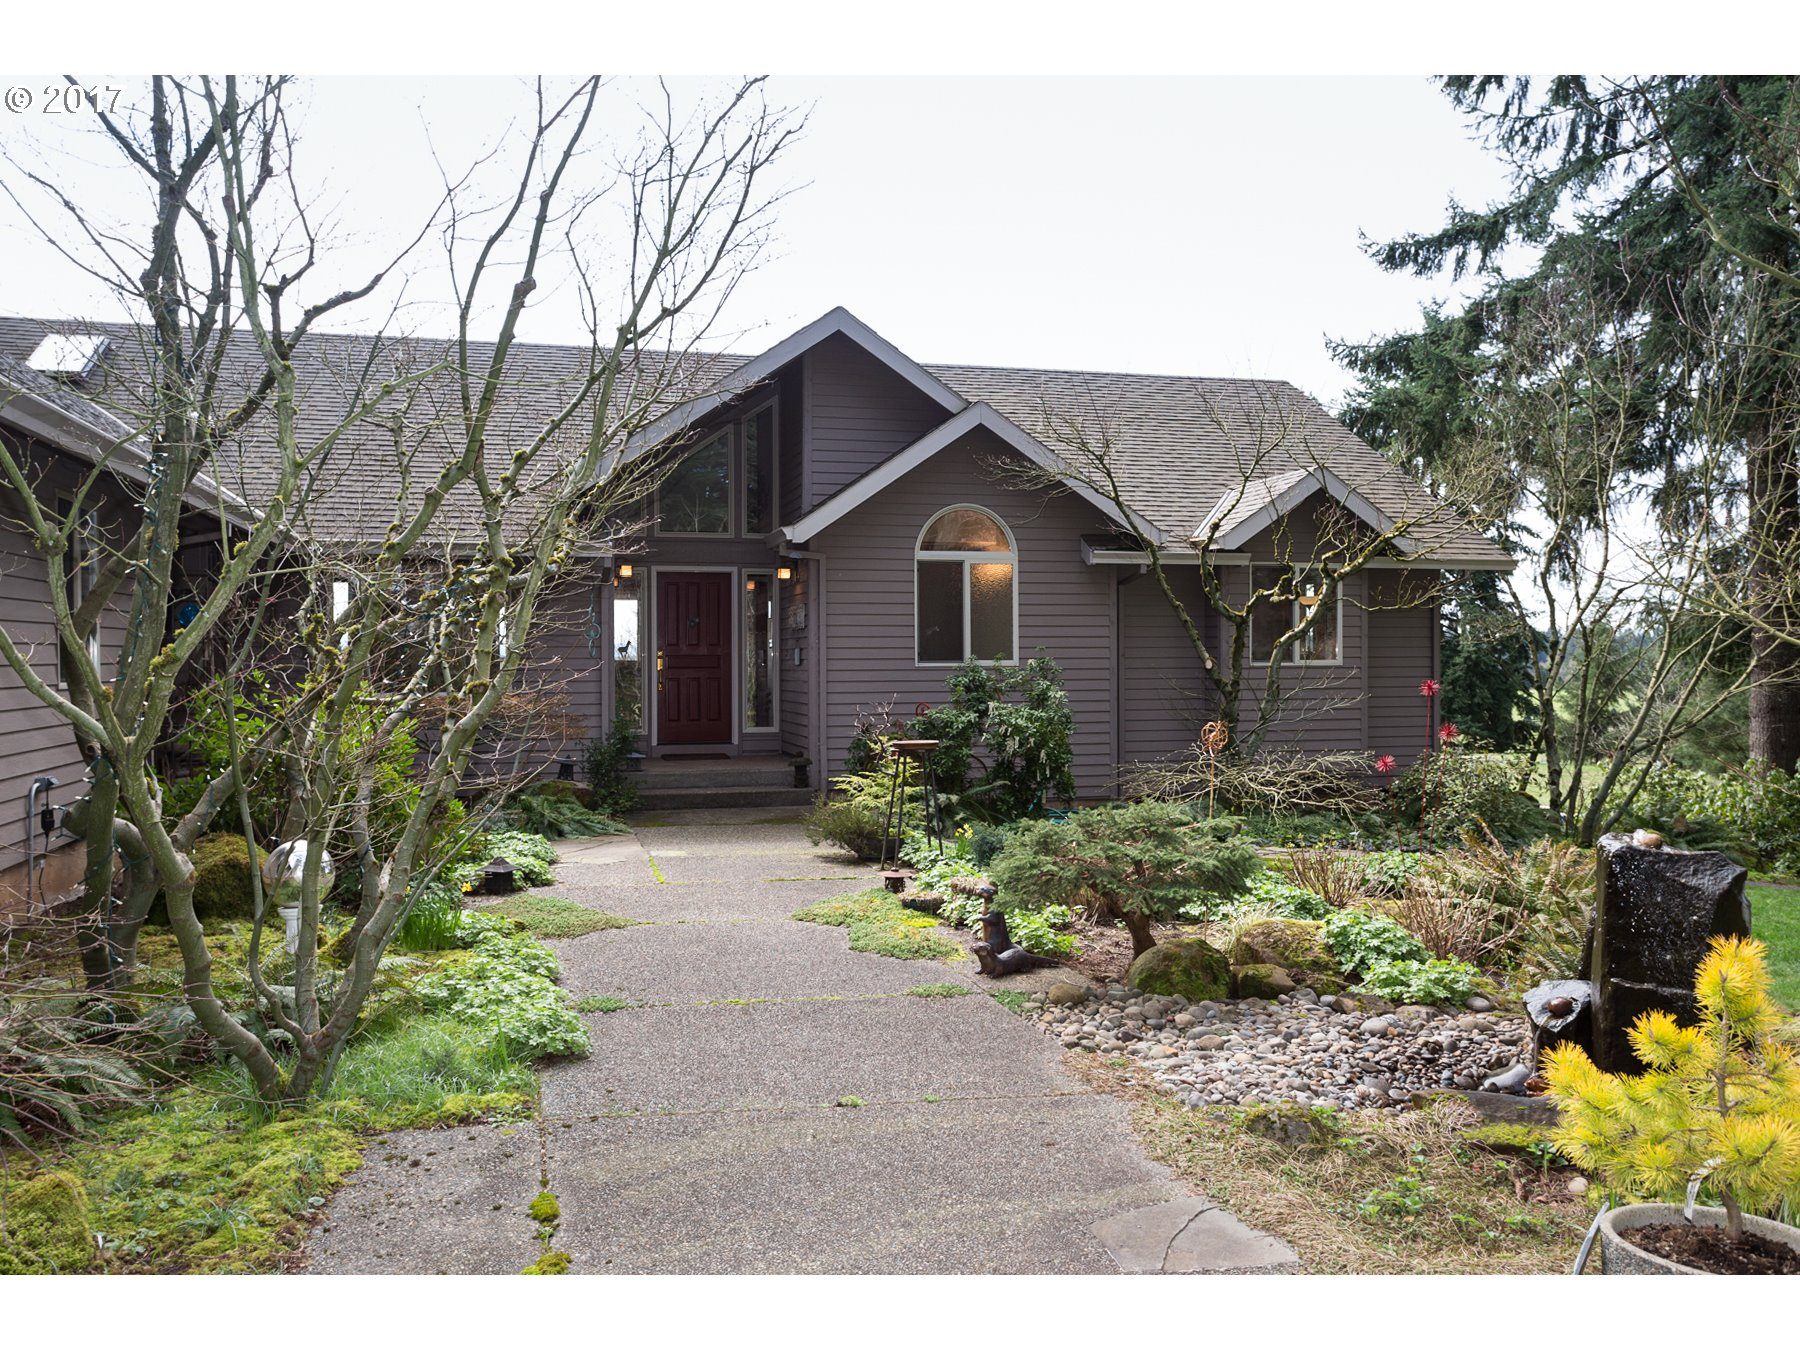 14988 S SPANGLER RD, Oregon City, OR 97045